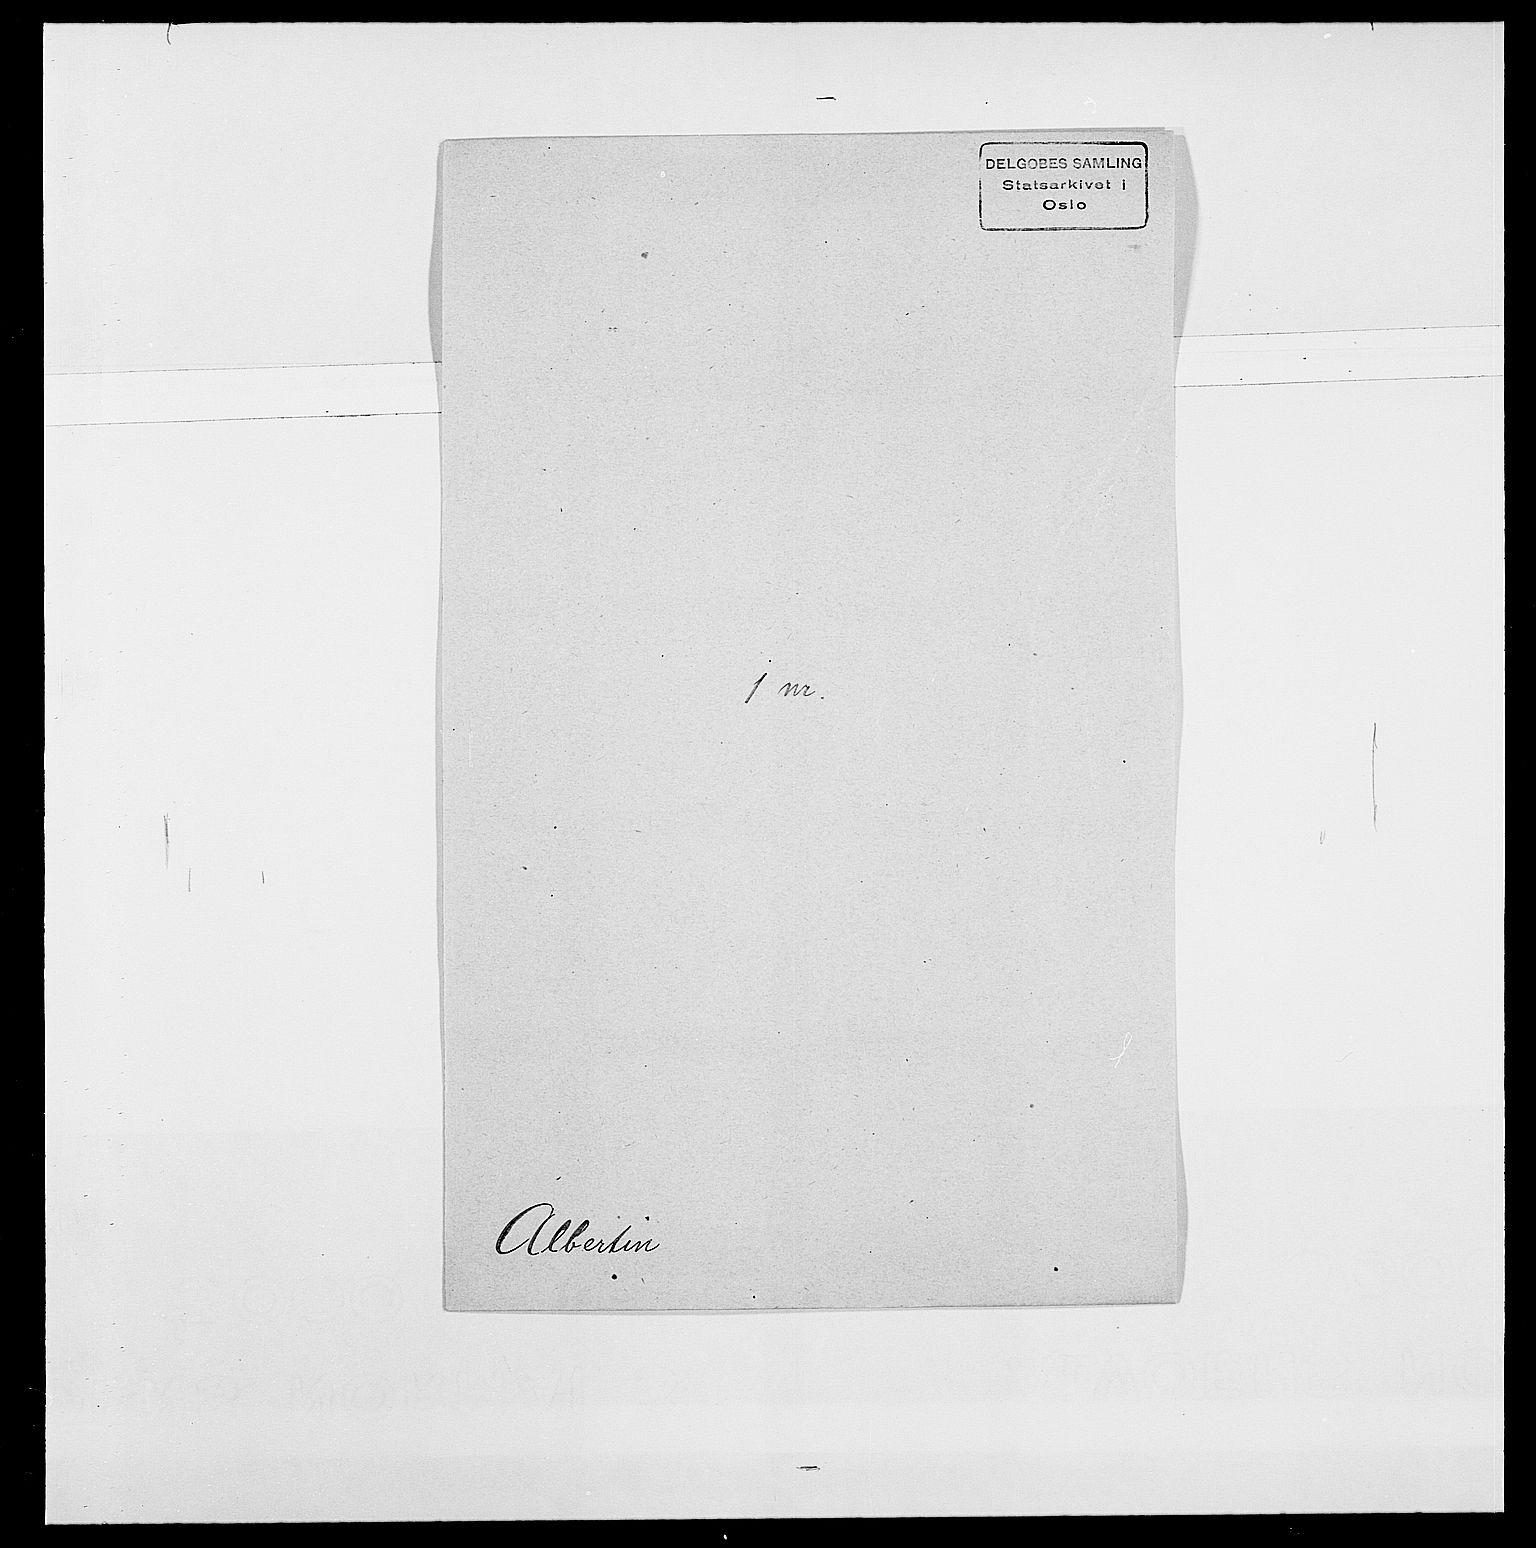 SAO, Delgobe, Charles Antoine - samling, D/Da/L0001: Aabye - Angerman, s. 372